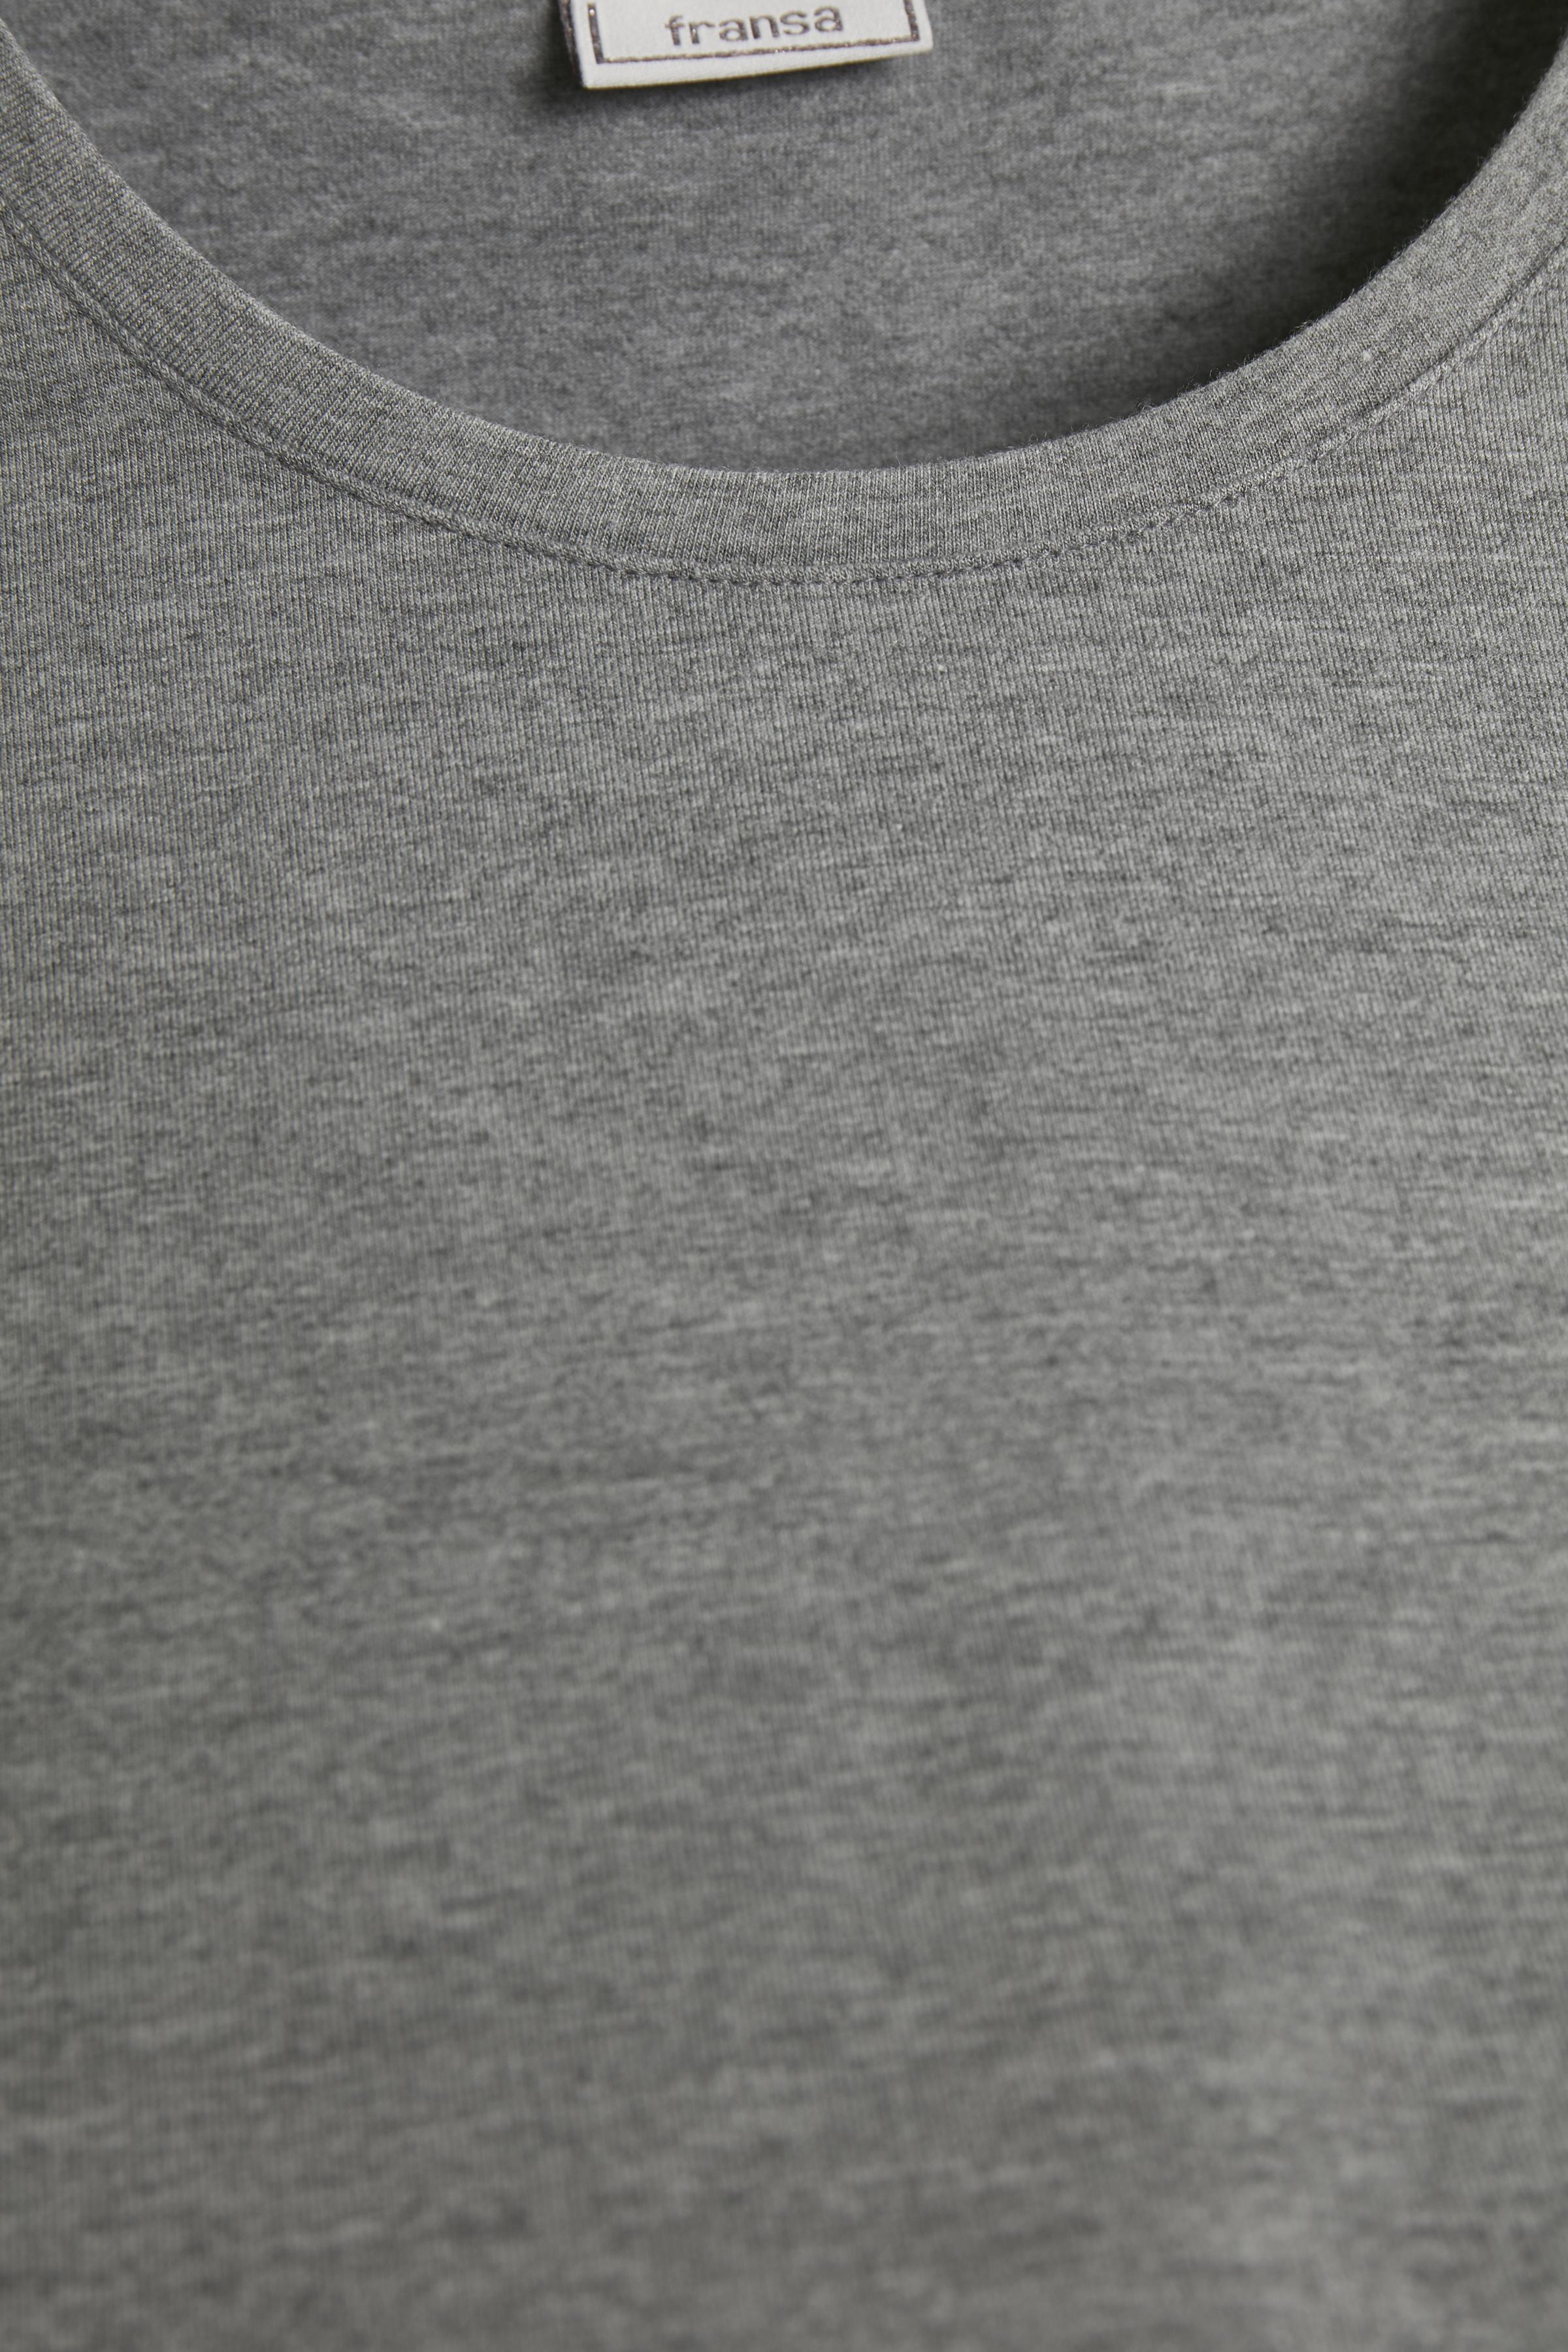 Grau meliert Langarm T-Shirt von Fransa – Shoppen Sie Grau meliert Langarm T-Shirt ab Gr. XS-XXL hier